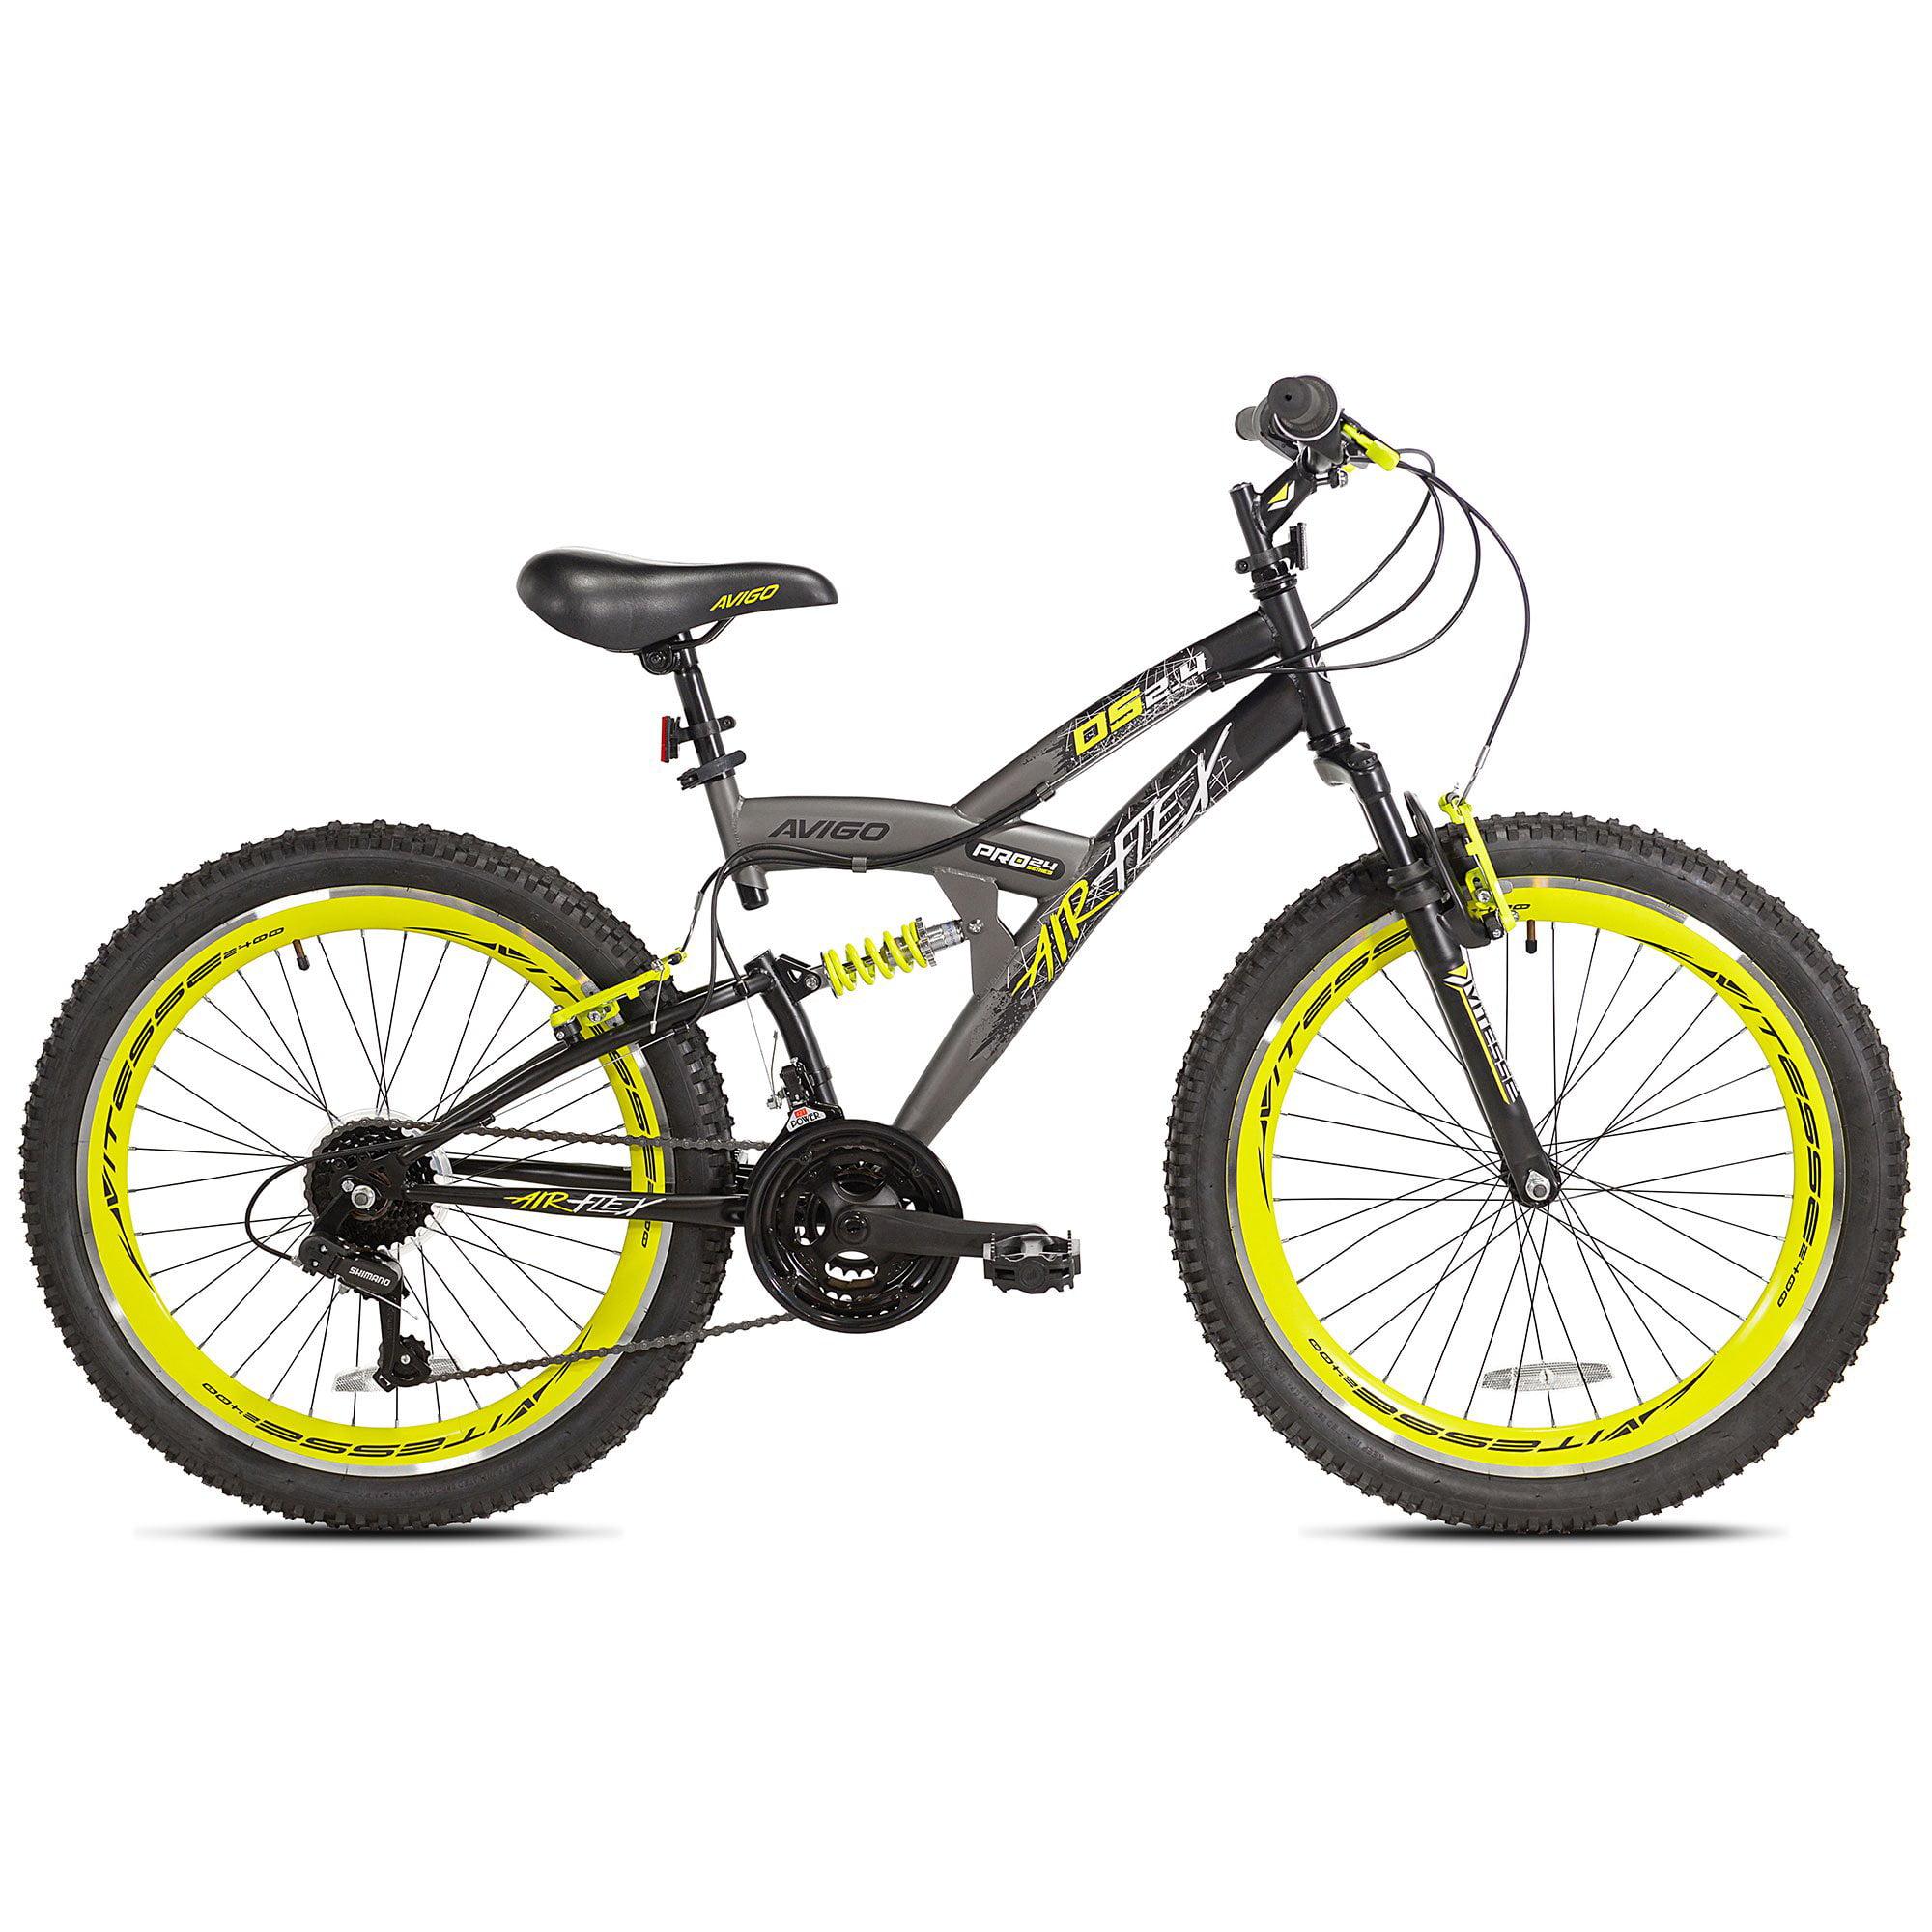 Kent Bikes Avigo Air Flex Dual Suspension Steel 24 Inch Boys BMX Bike, Yellow by Kent Bikes